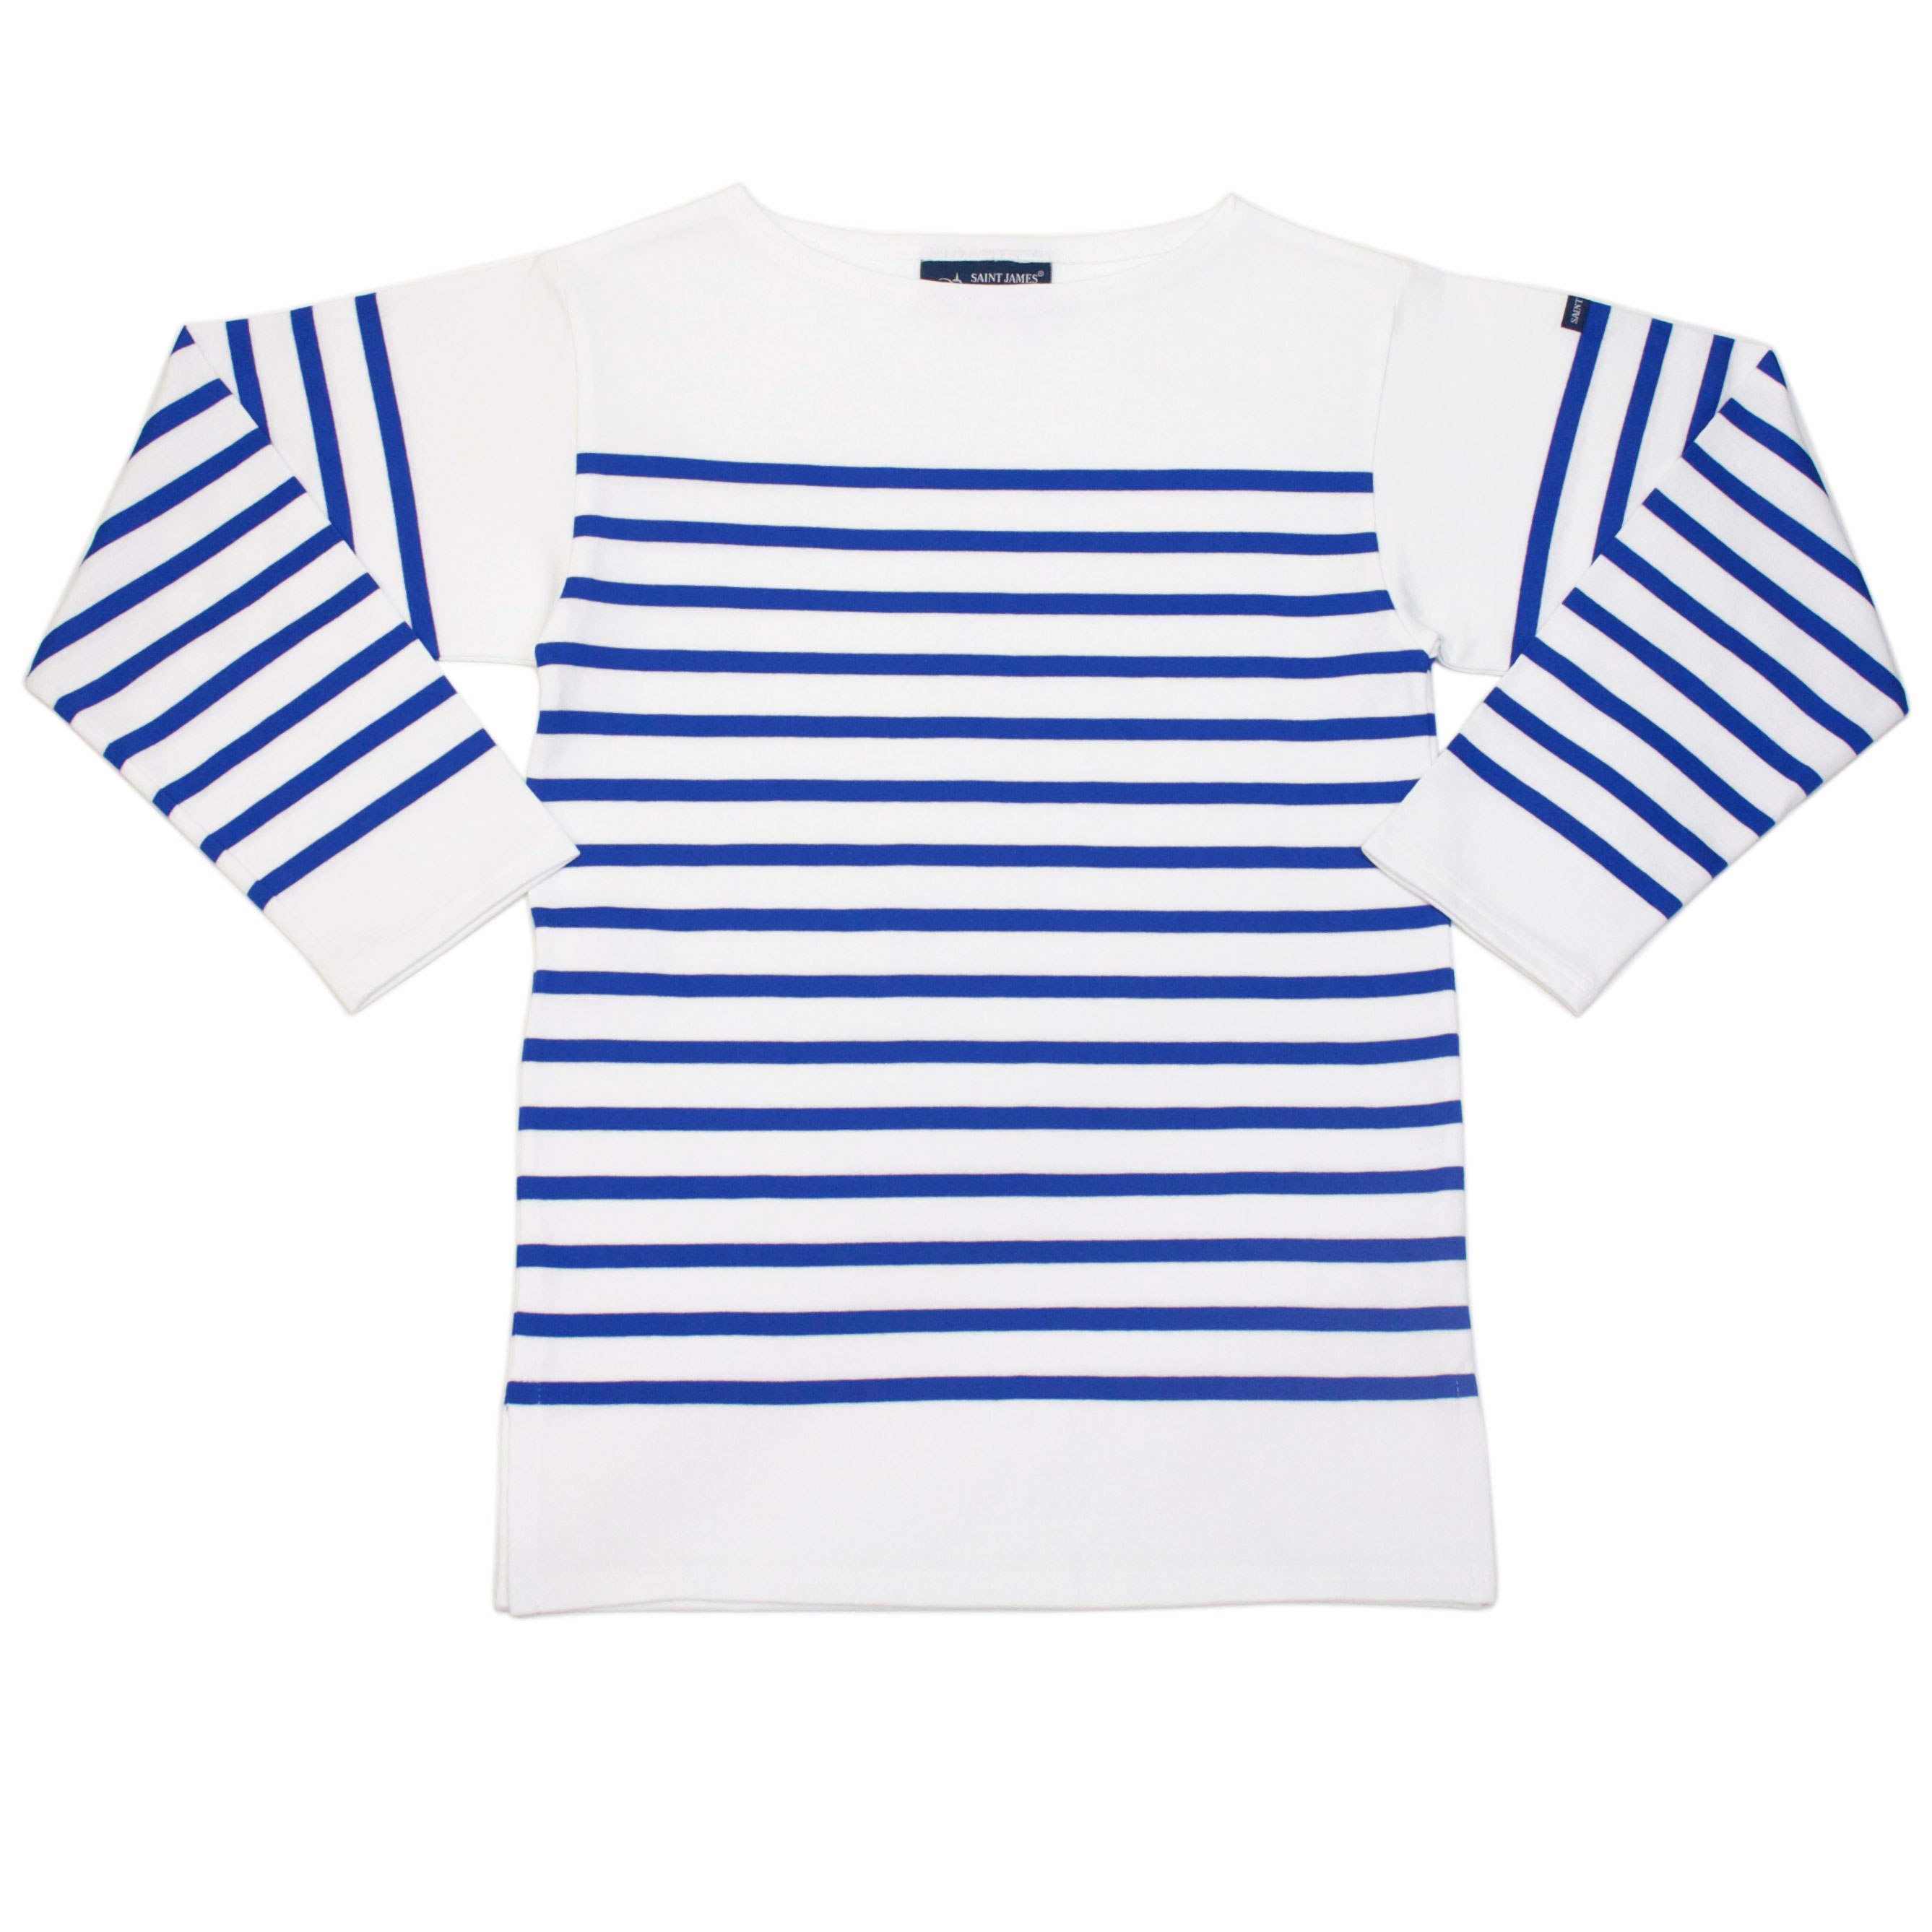 http://image1.shopserve.jp/shop-st-james.jp/pic-labo/nl003.jpg?t=20120525123529